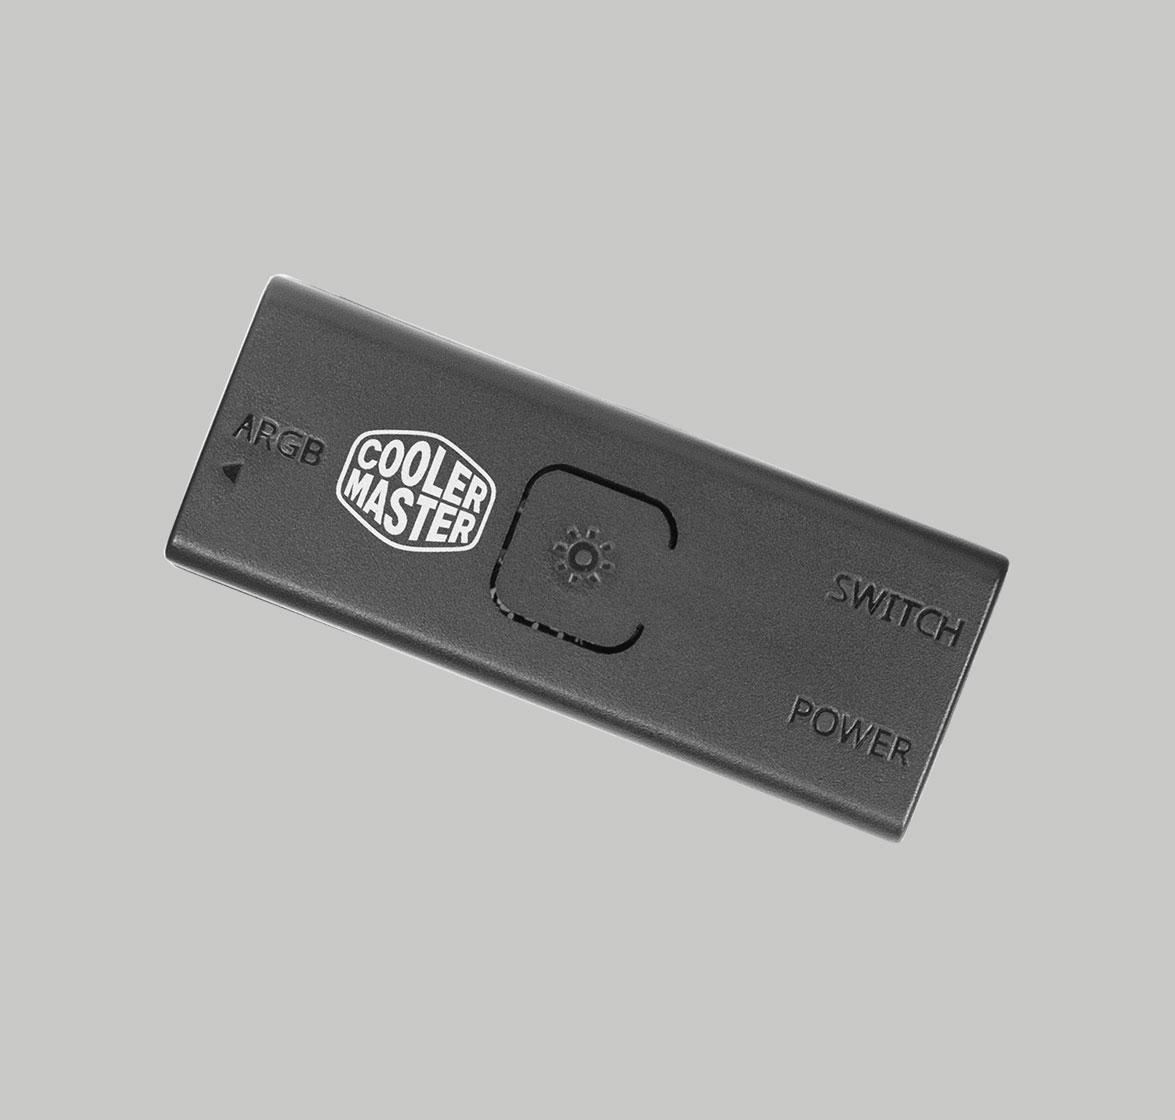 ARGB Controller